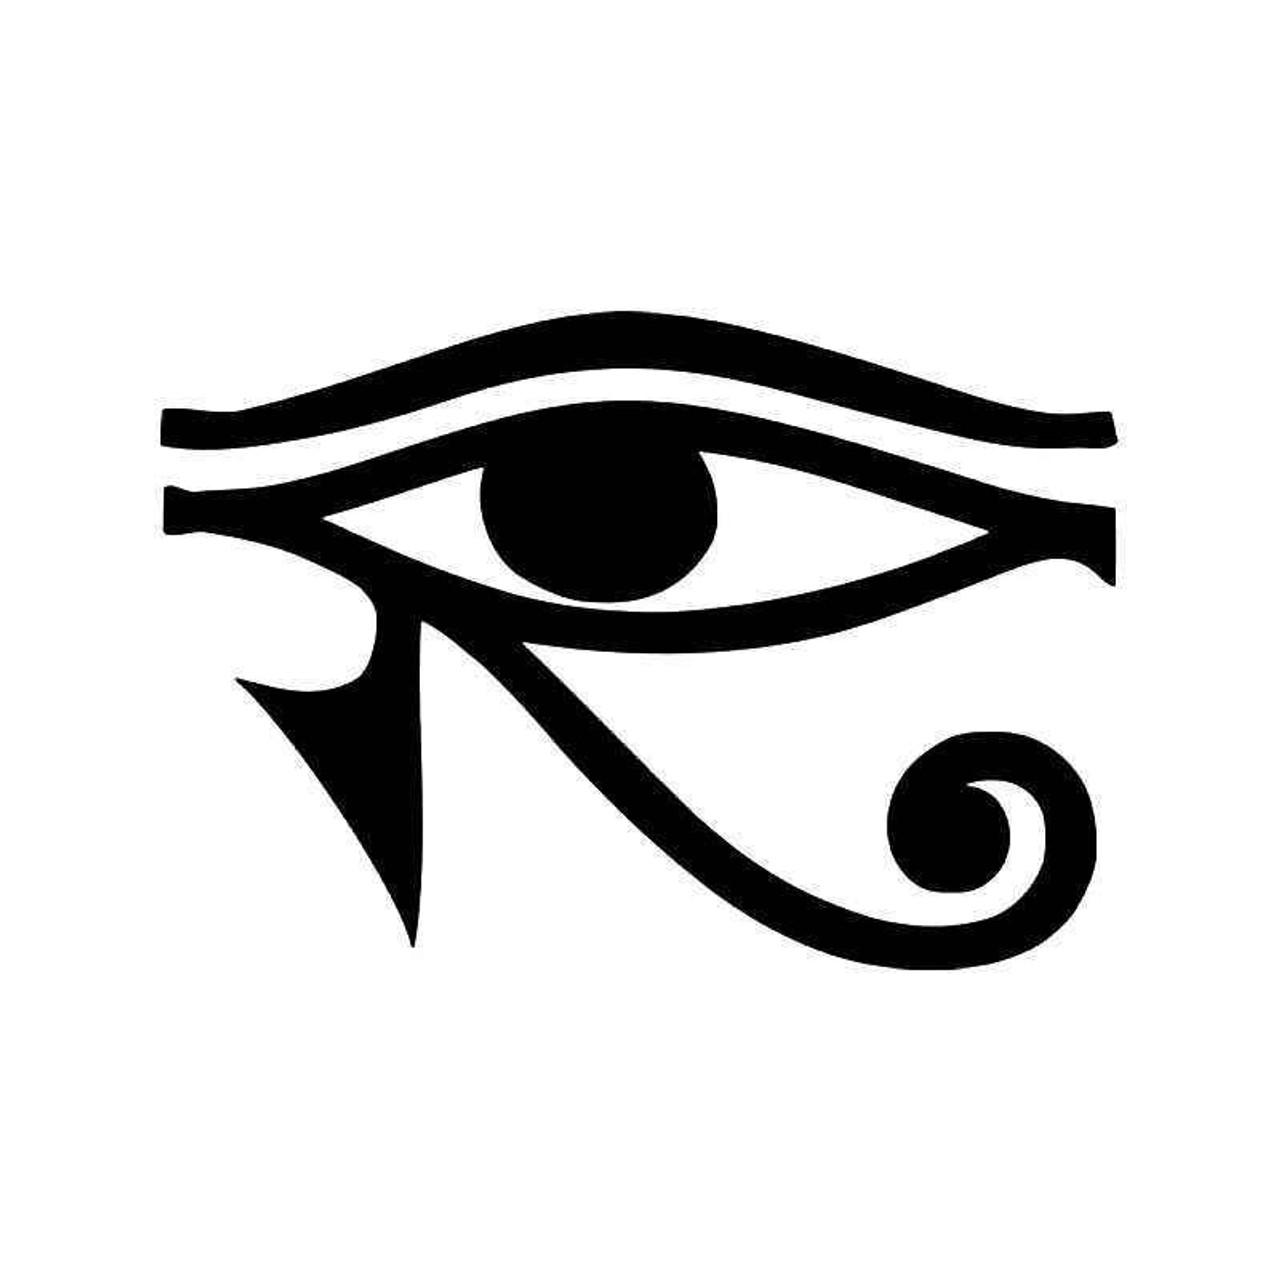 Eye Of Horus Egyptian Pagan Symbol Vinyl Sticker